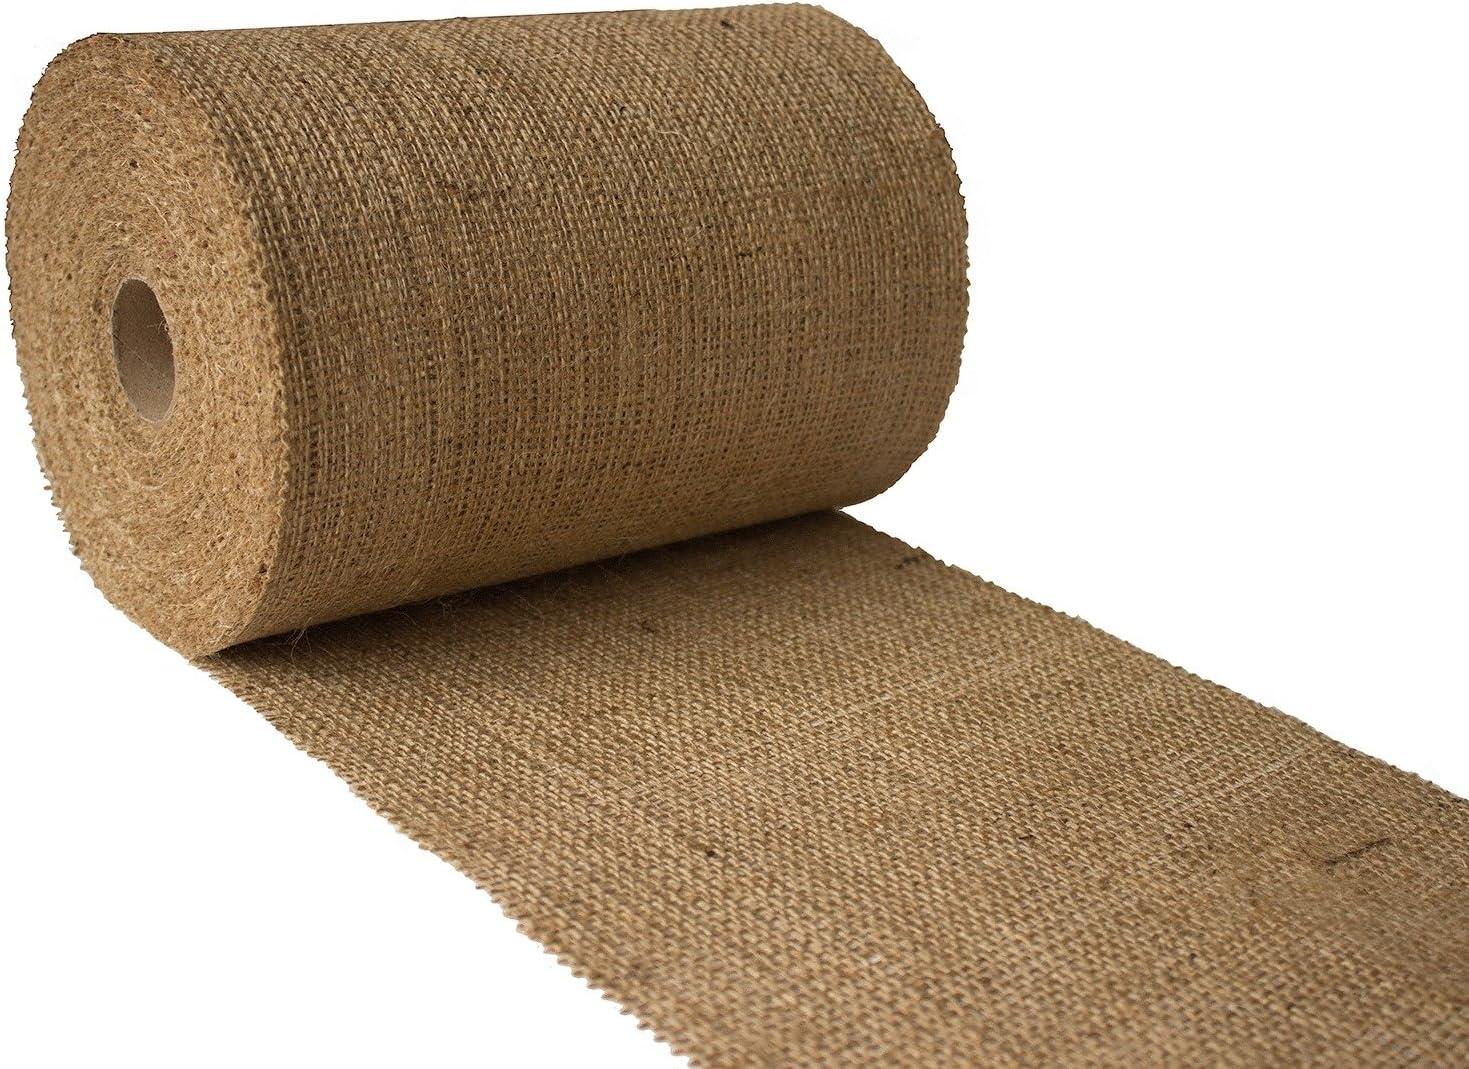 Burlapper 8 x 10 Yards 10 oz Jute Burlap Ribbon Roll